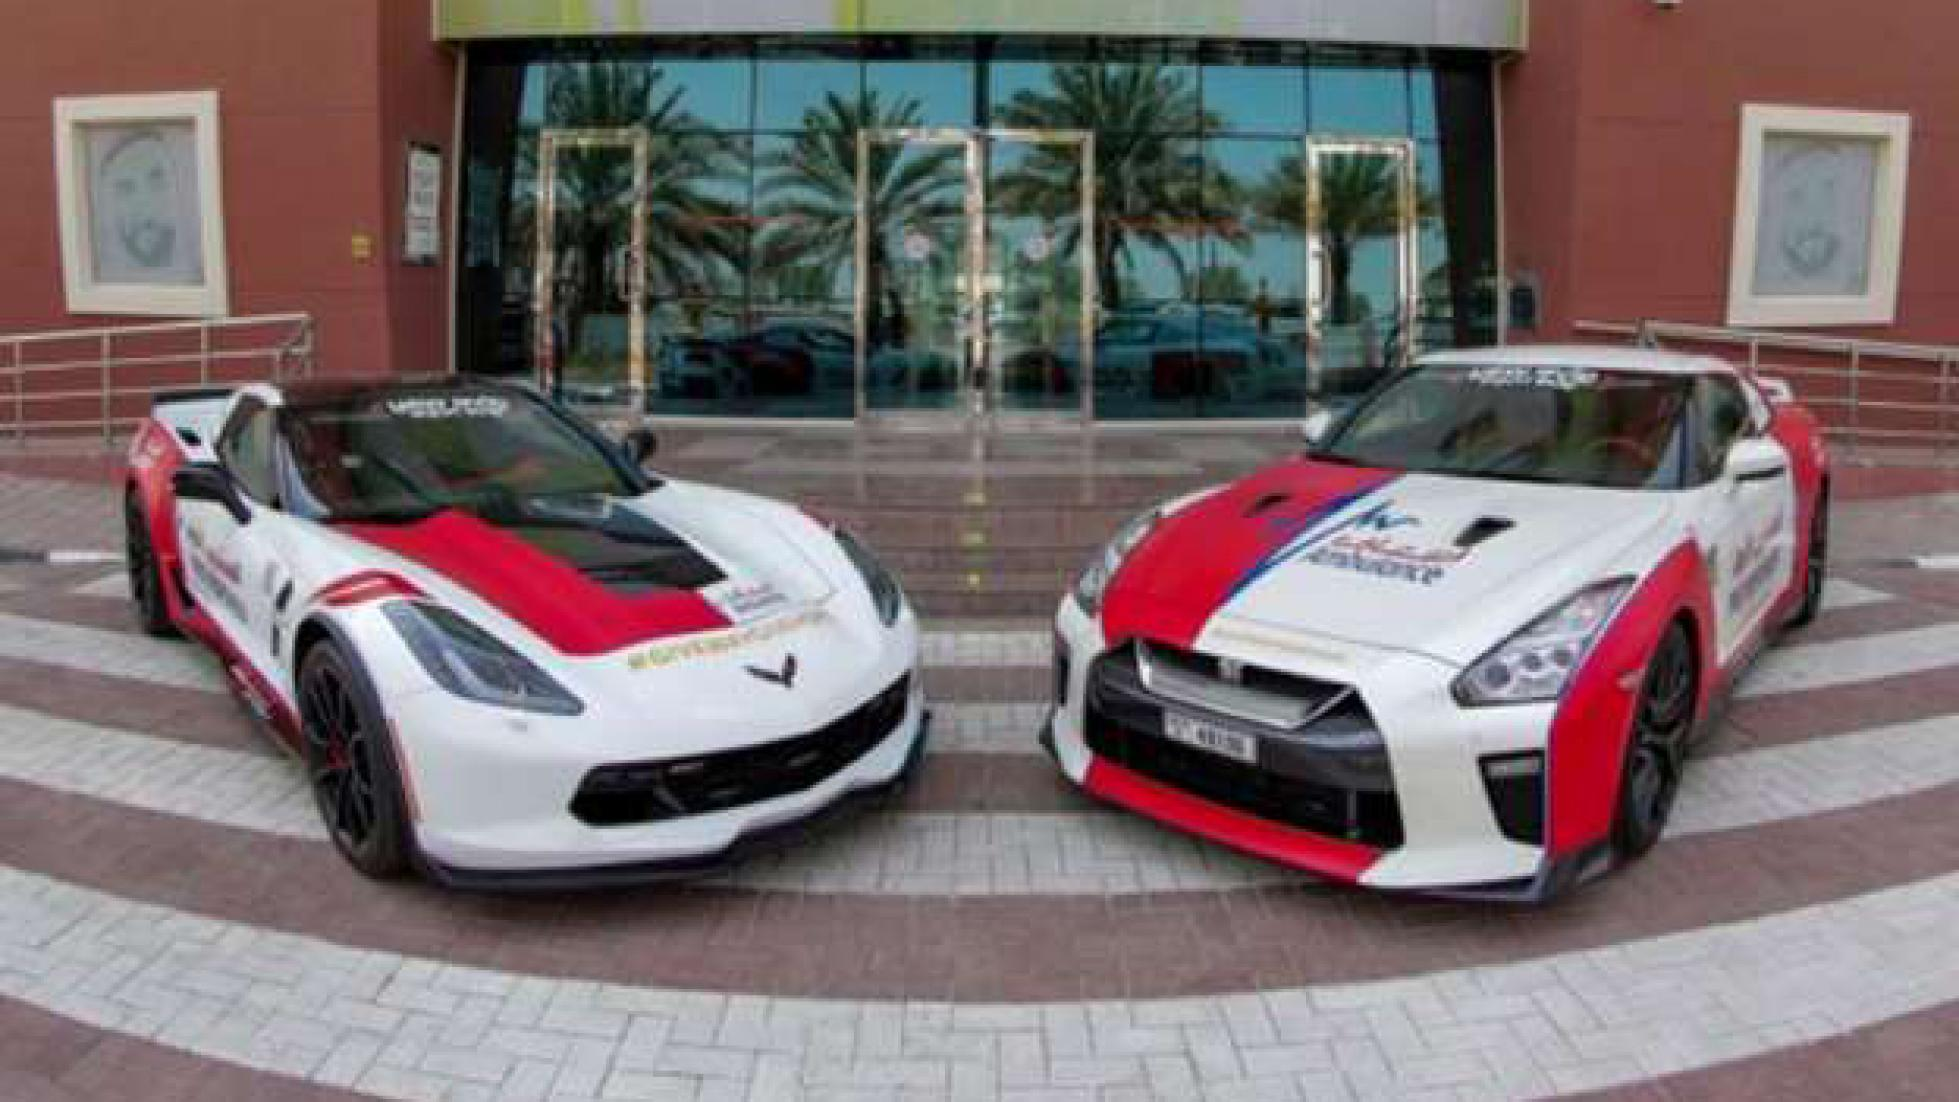 Nissan GT-R i Corvette C7 kao vozila Službe hitne pomoći u Dubaiju